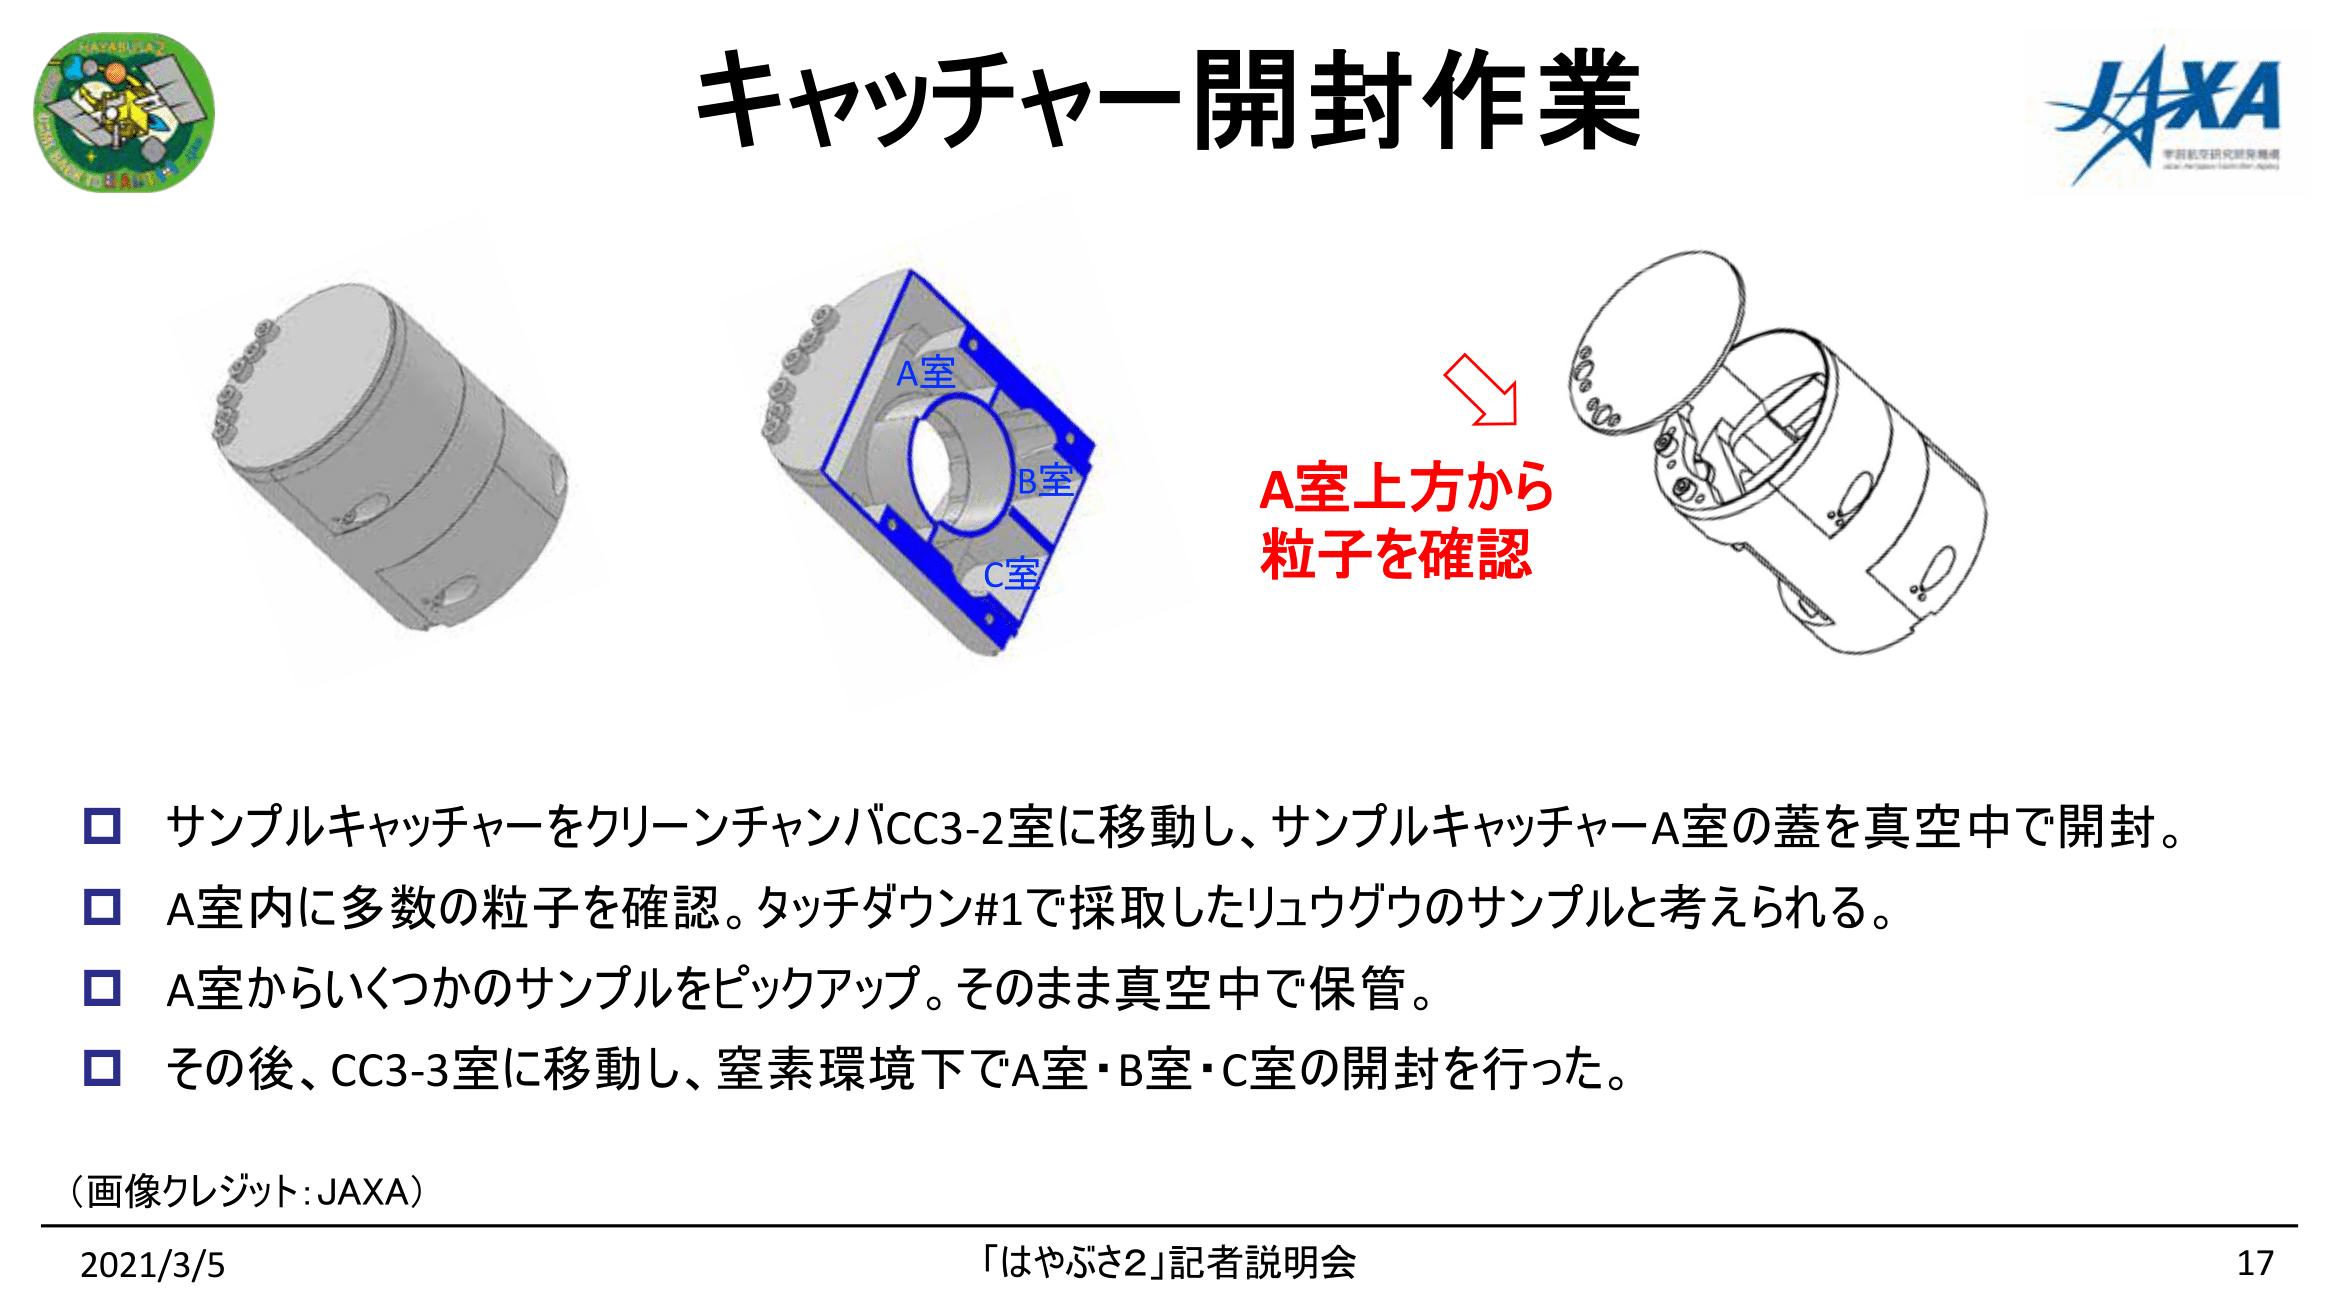 f:id:Imamura:20210305134307p:plain